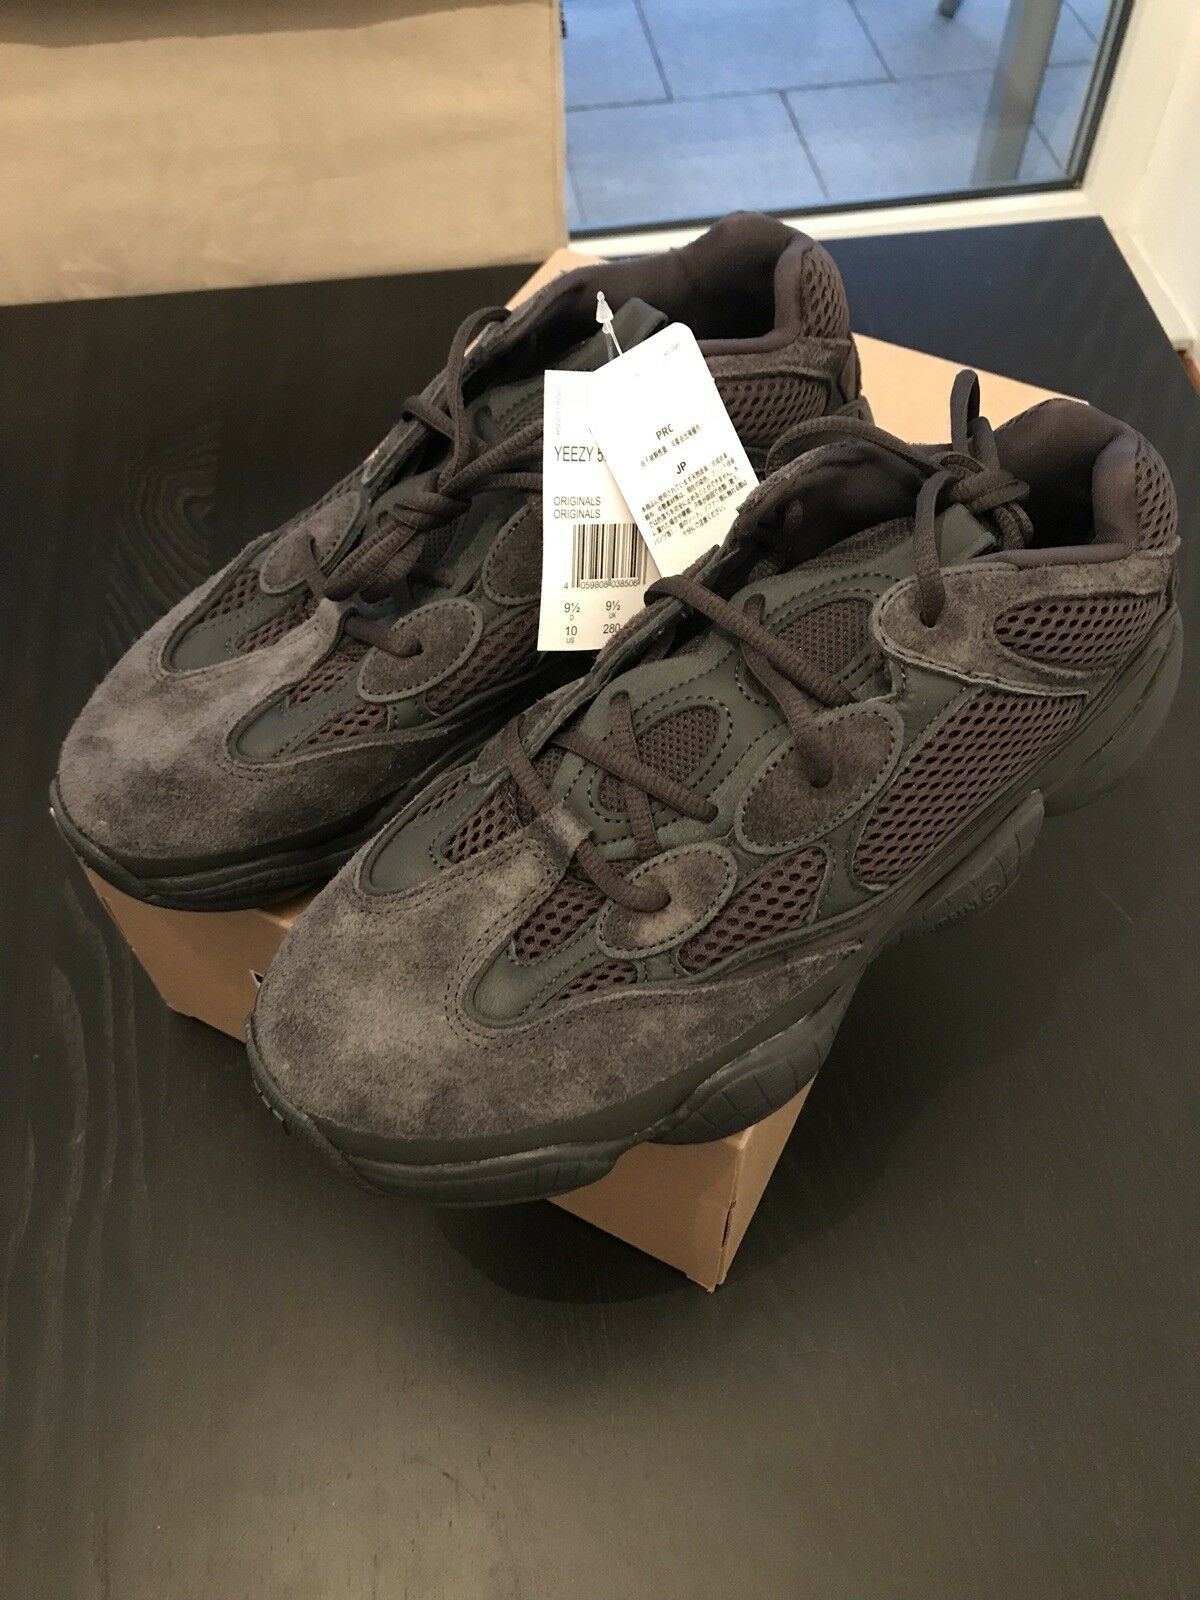 Adidas Yeezy Desert Rat 500 Black F36640